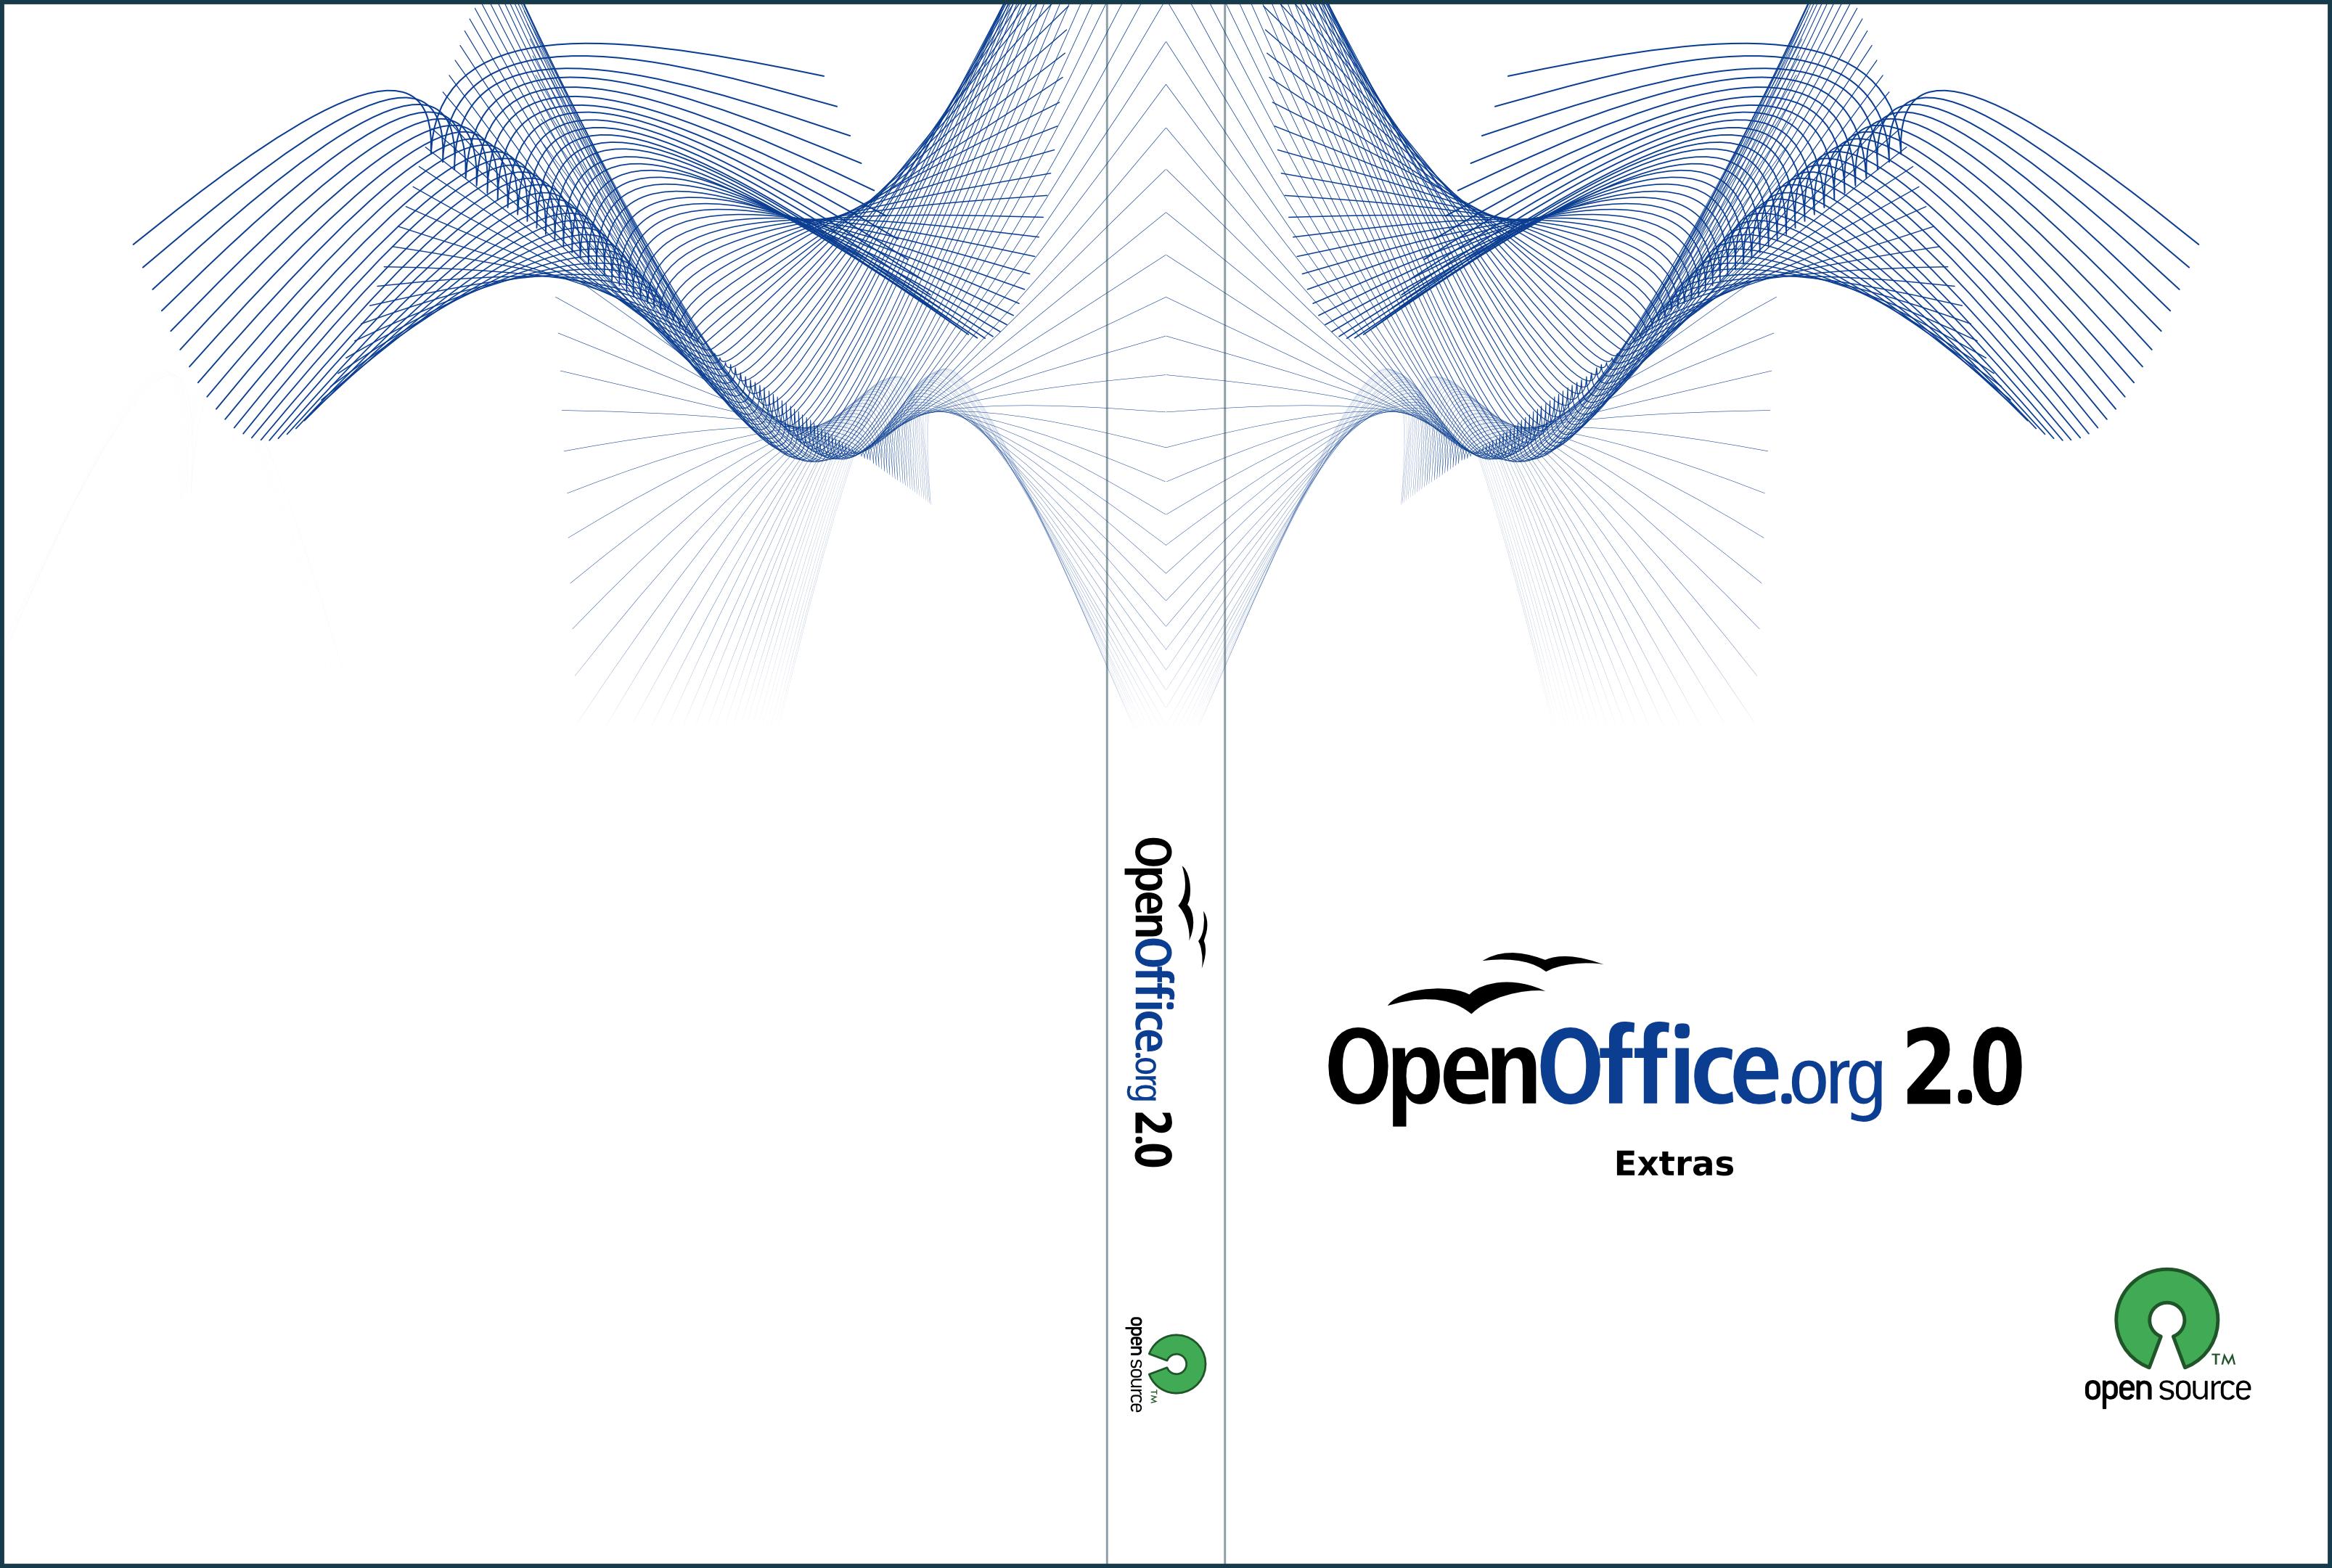 Openoffice Cd Art Previous Versions